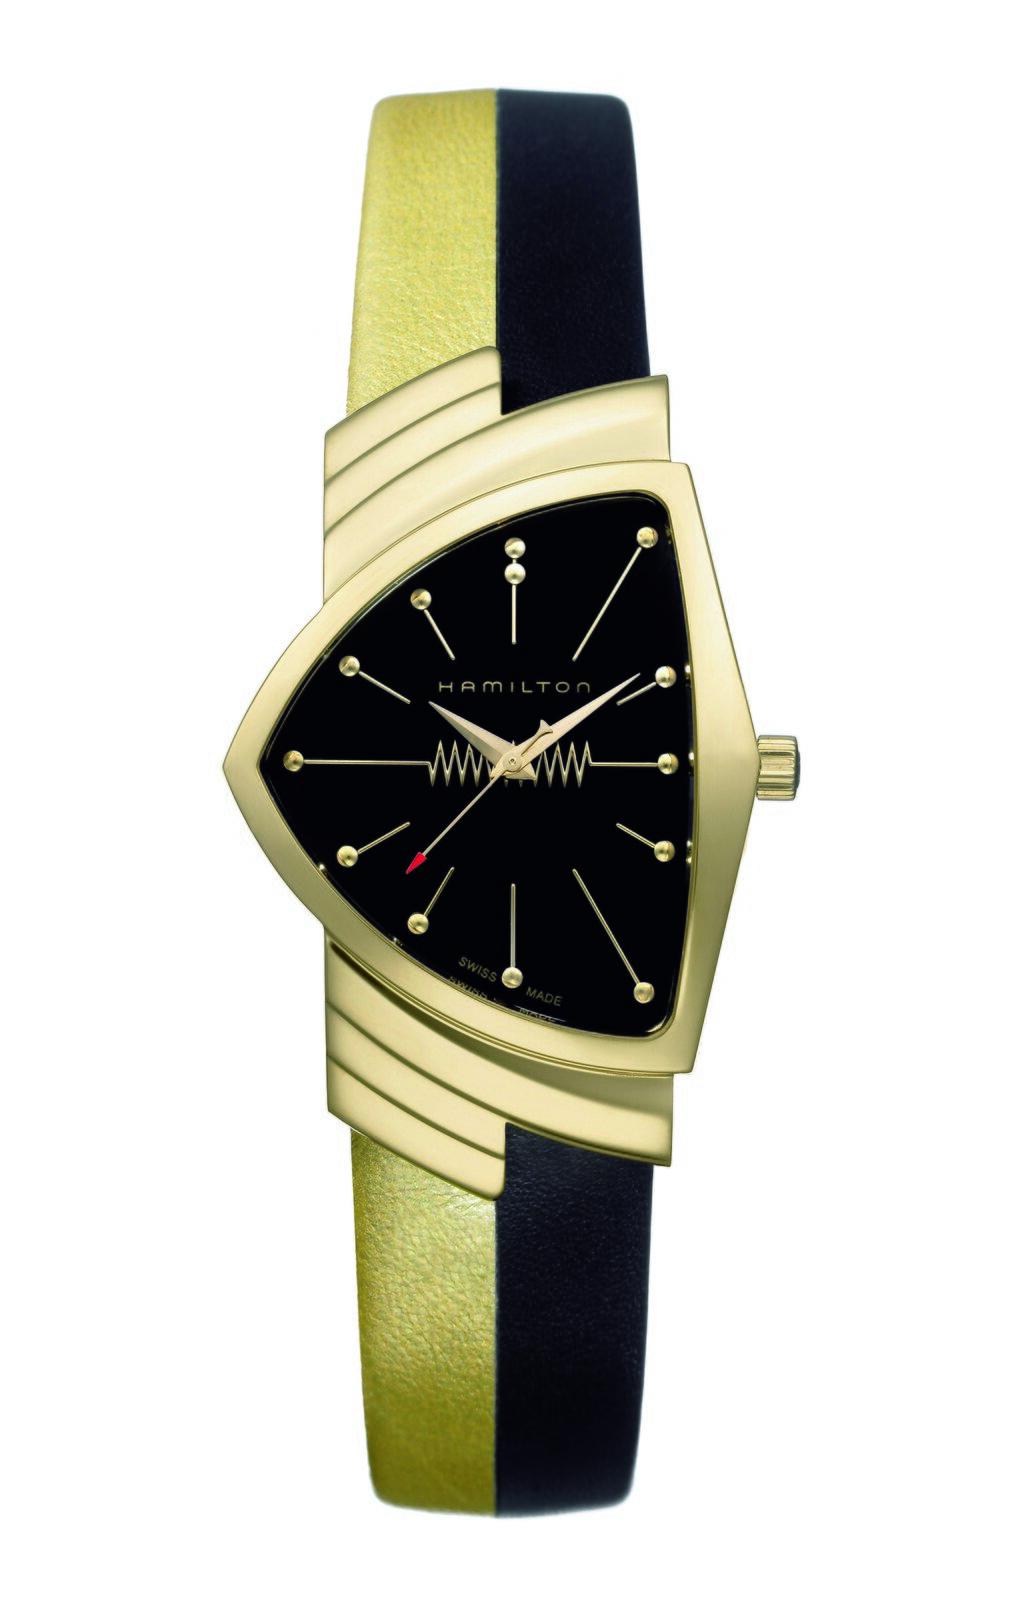 Zegarek Hamilton Zegarek Hamilton Źródło: Hamiltonwatches, 1957, fotografia barwna, licencja: CC BY-SA 3.0.